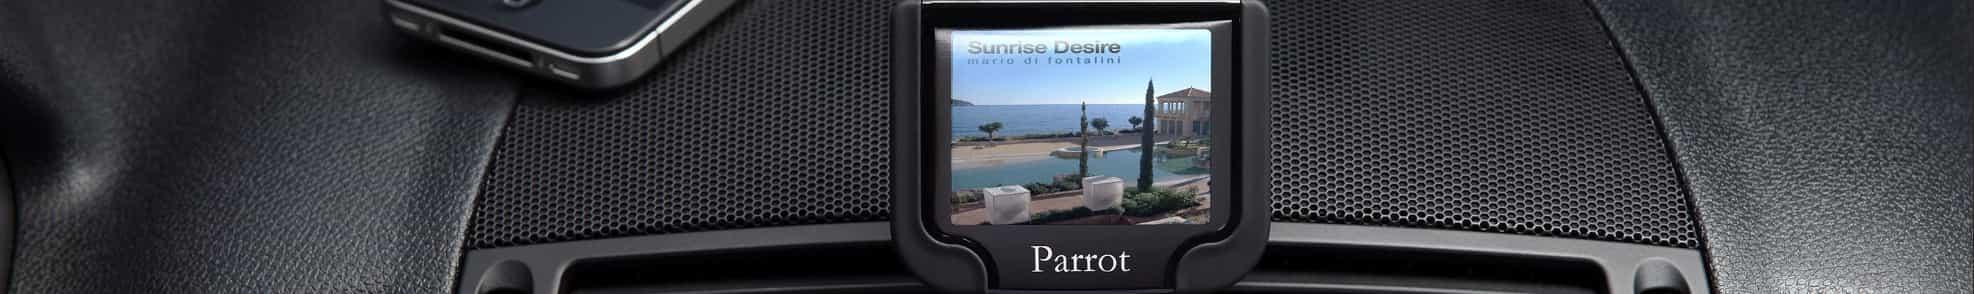 Parrot bluetooth car kit screen